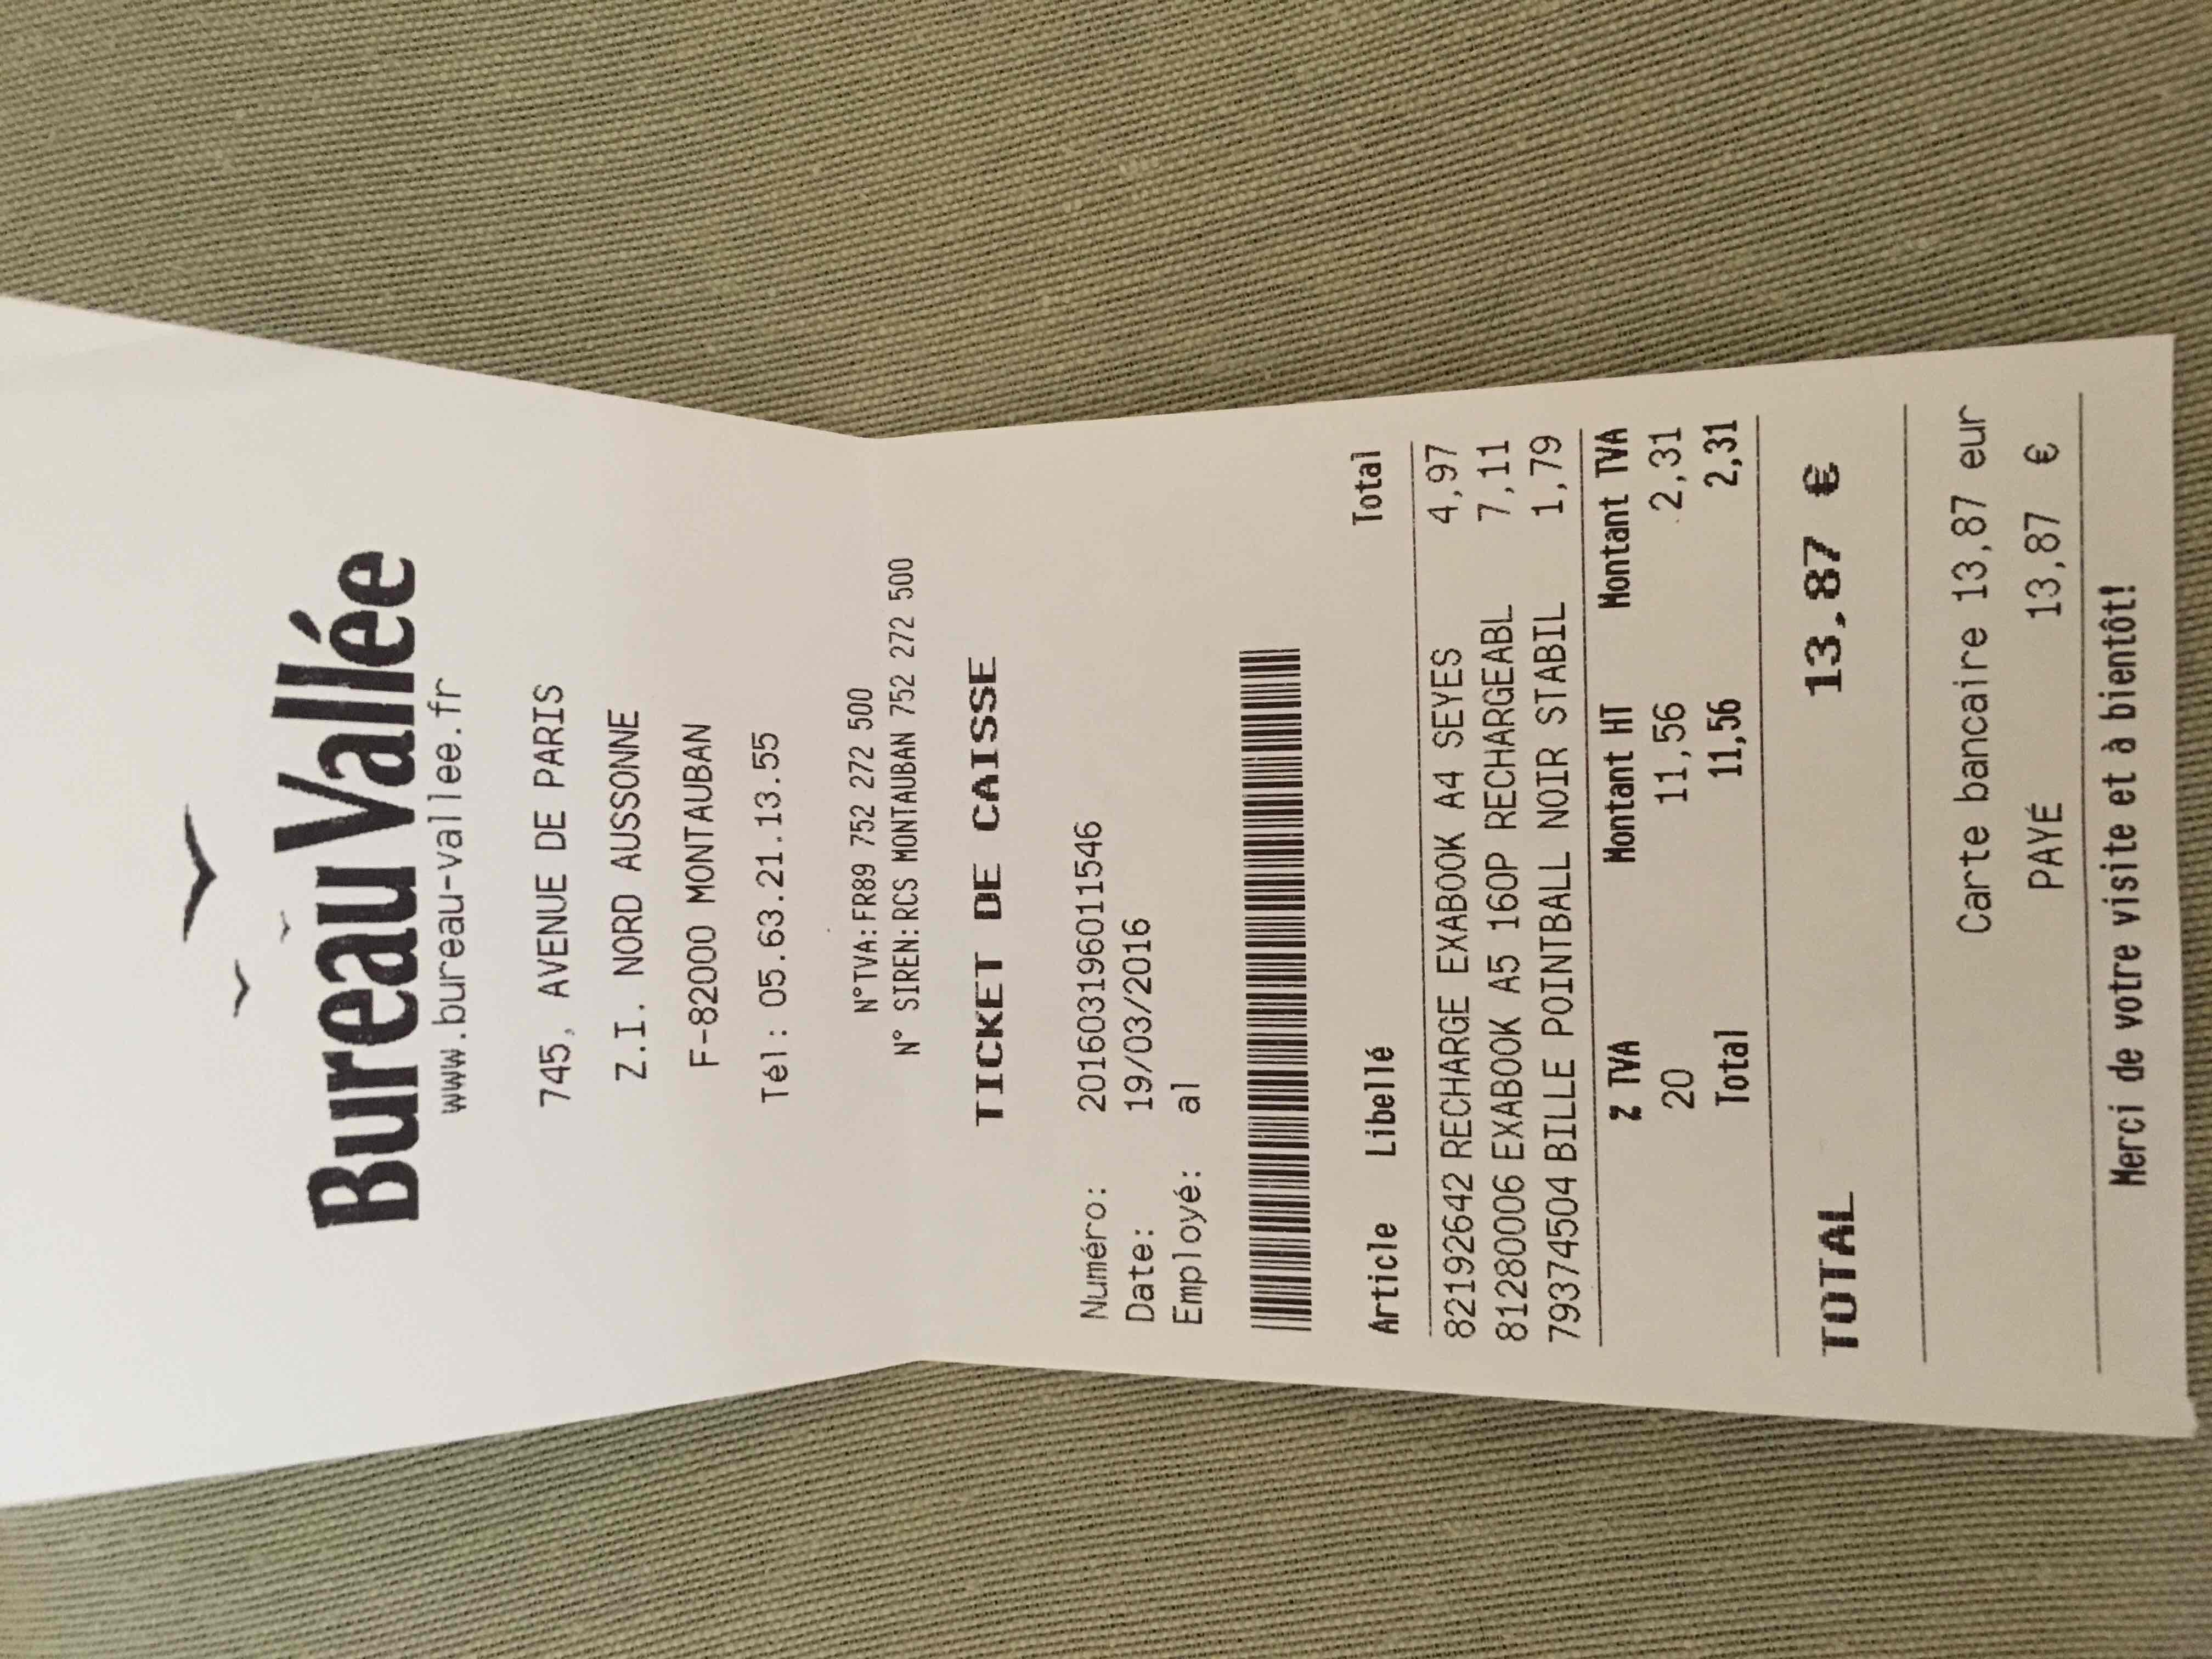 Bureau Vallee Montauban Contact The Director